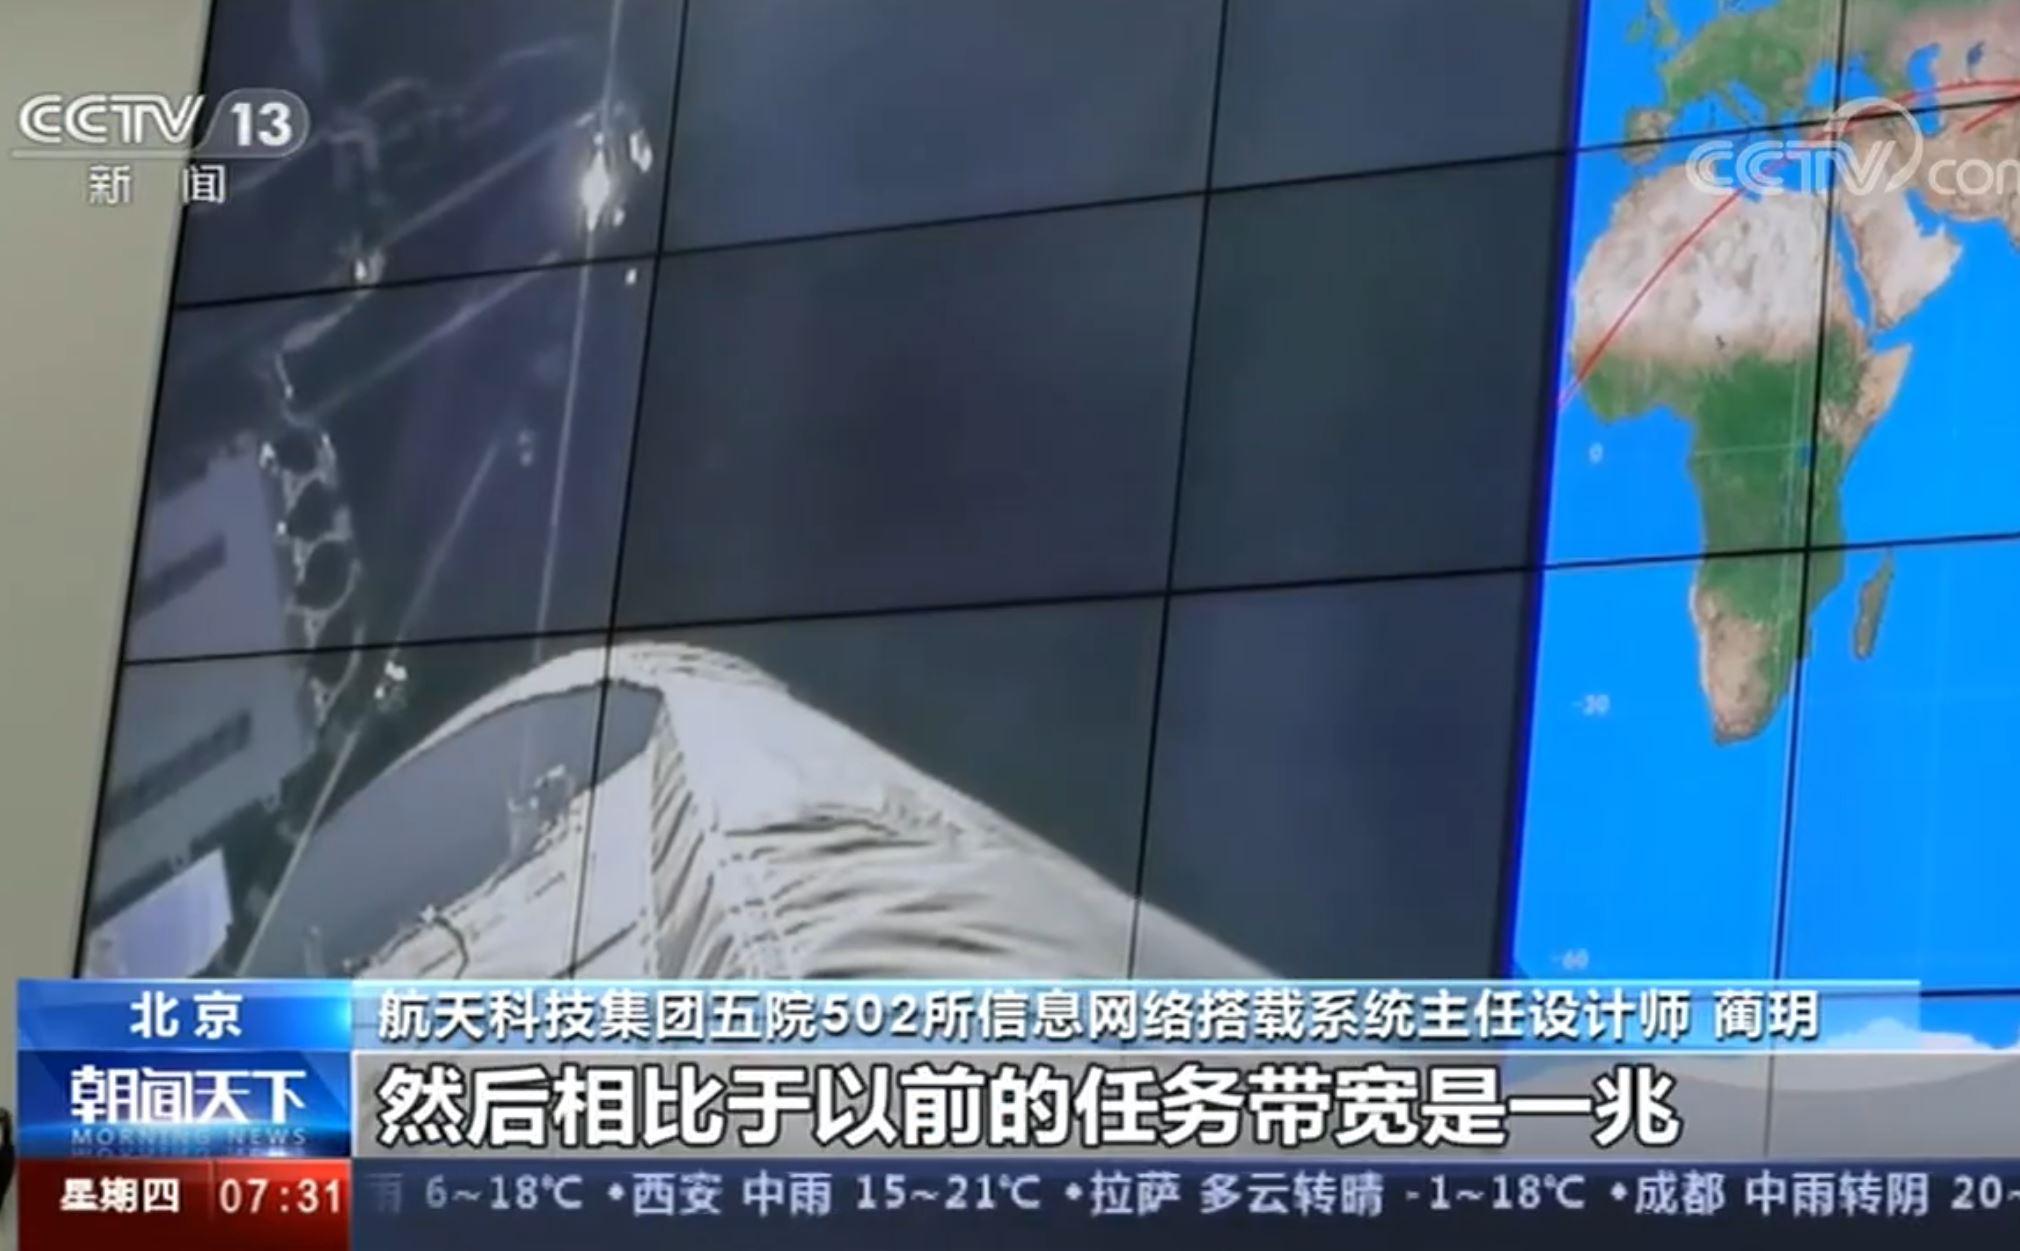 2020-7-may-chinese-spacecraft-2.jpg